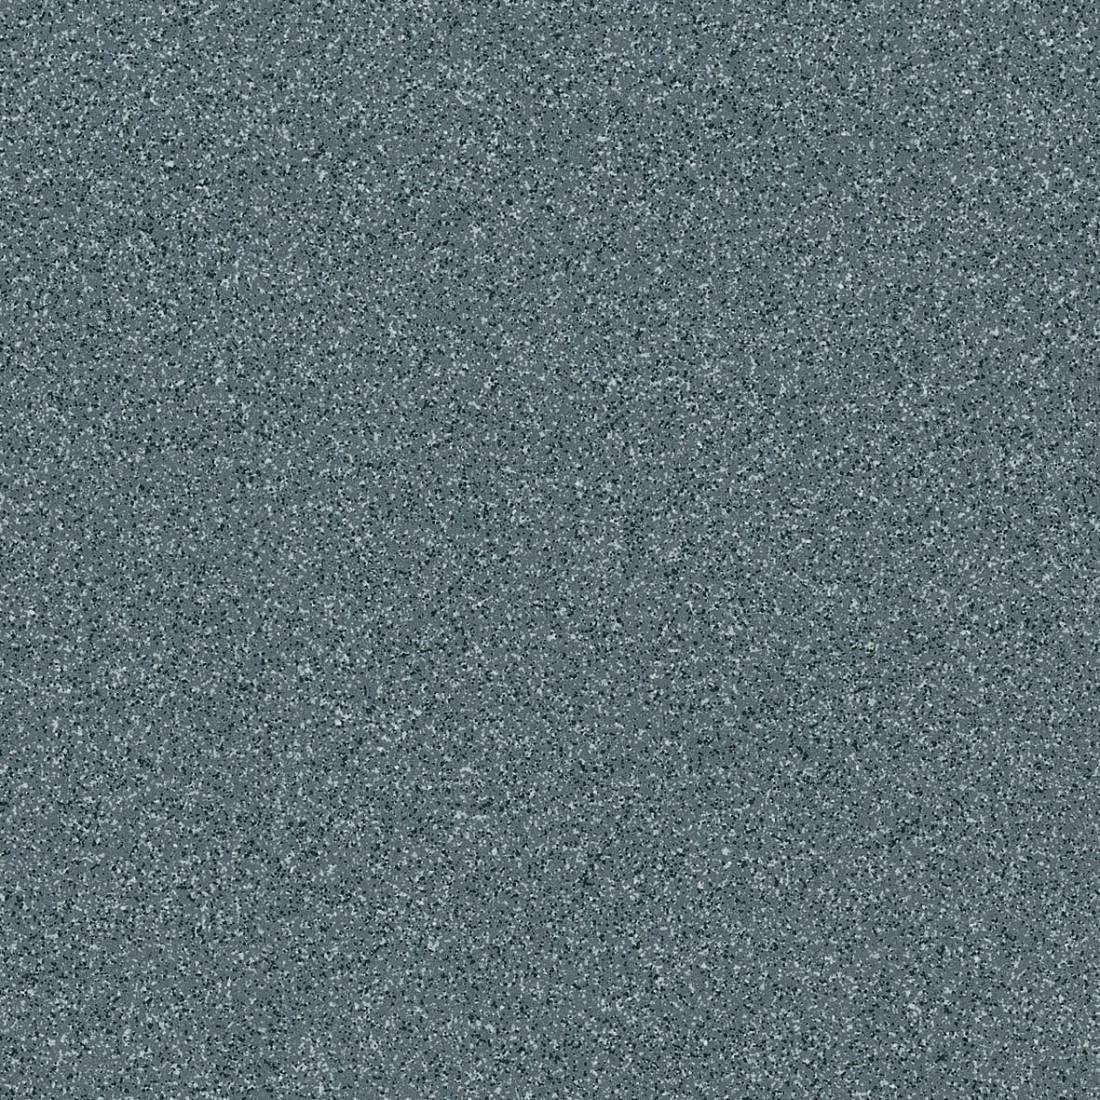 Granit 30x30 Antracit Dark Grey Matt R9 1